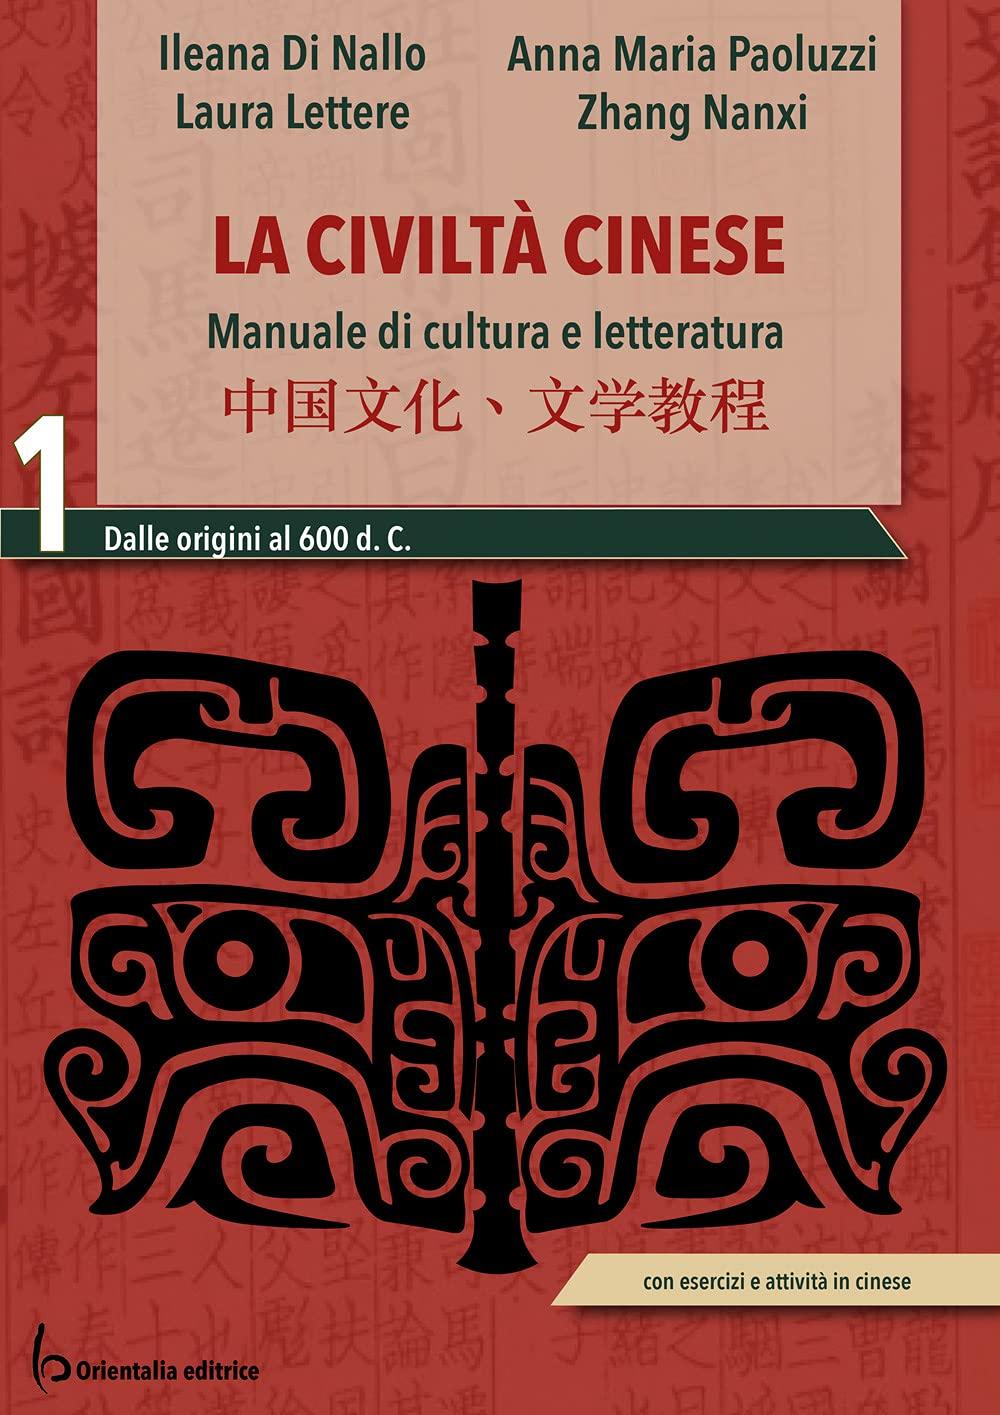 La civiltà cinese